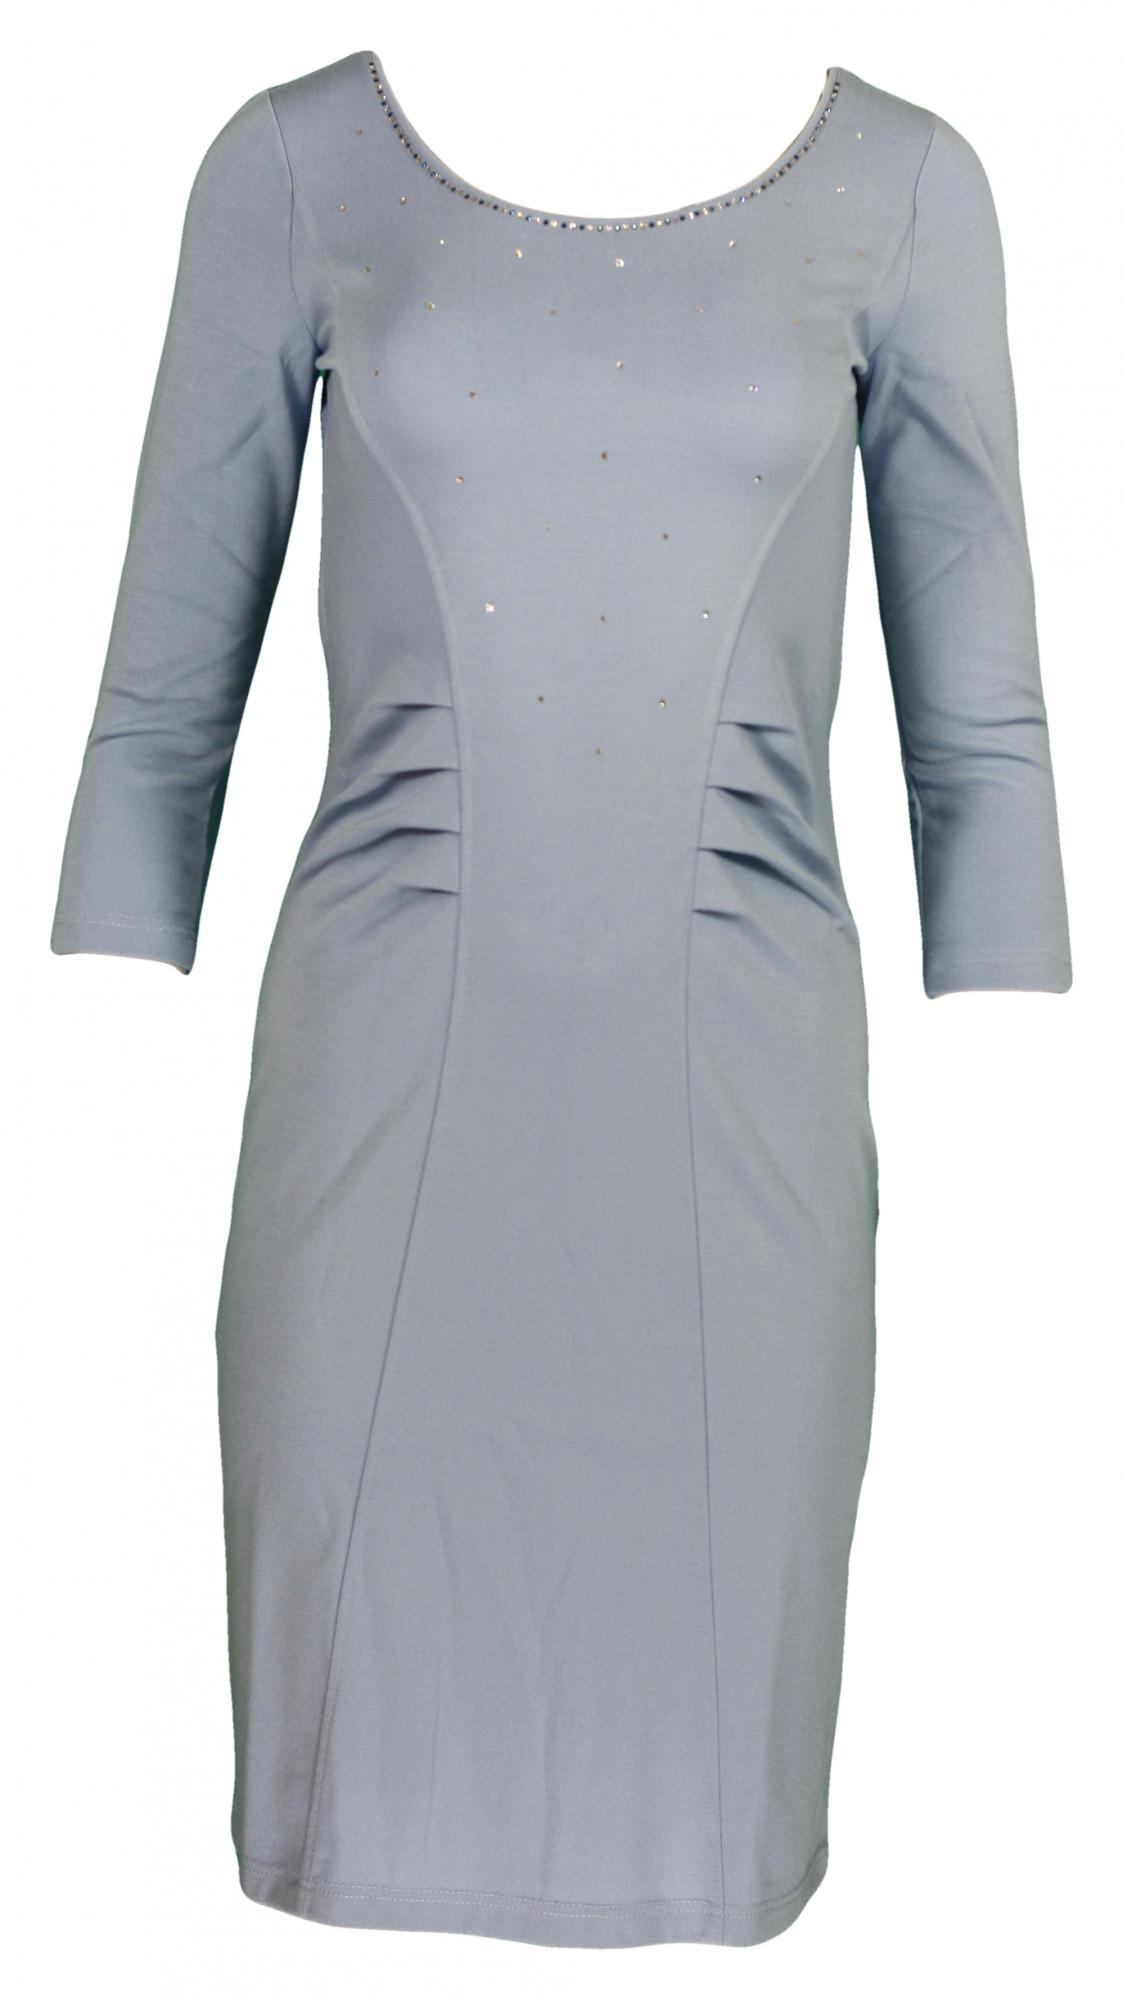 Dámske šaty Ninaka - Favab modrá M